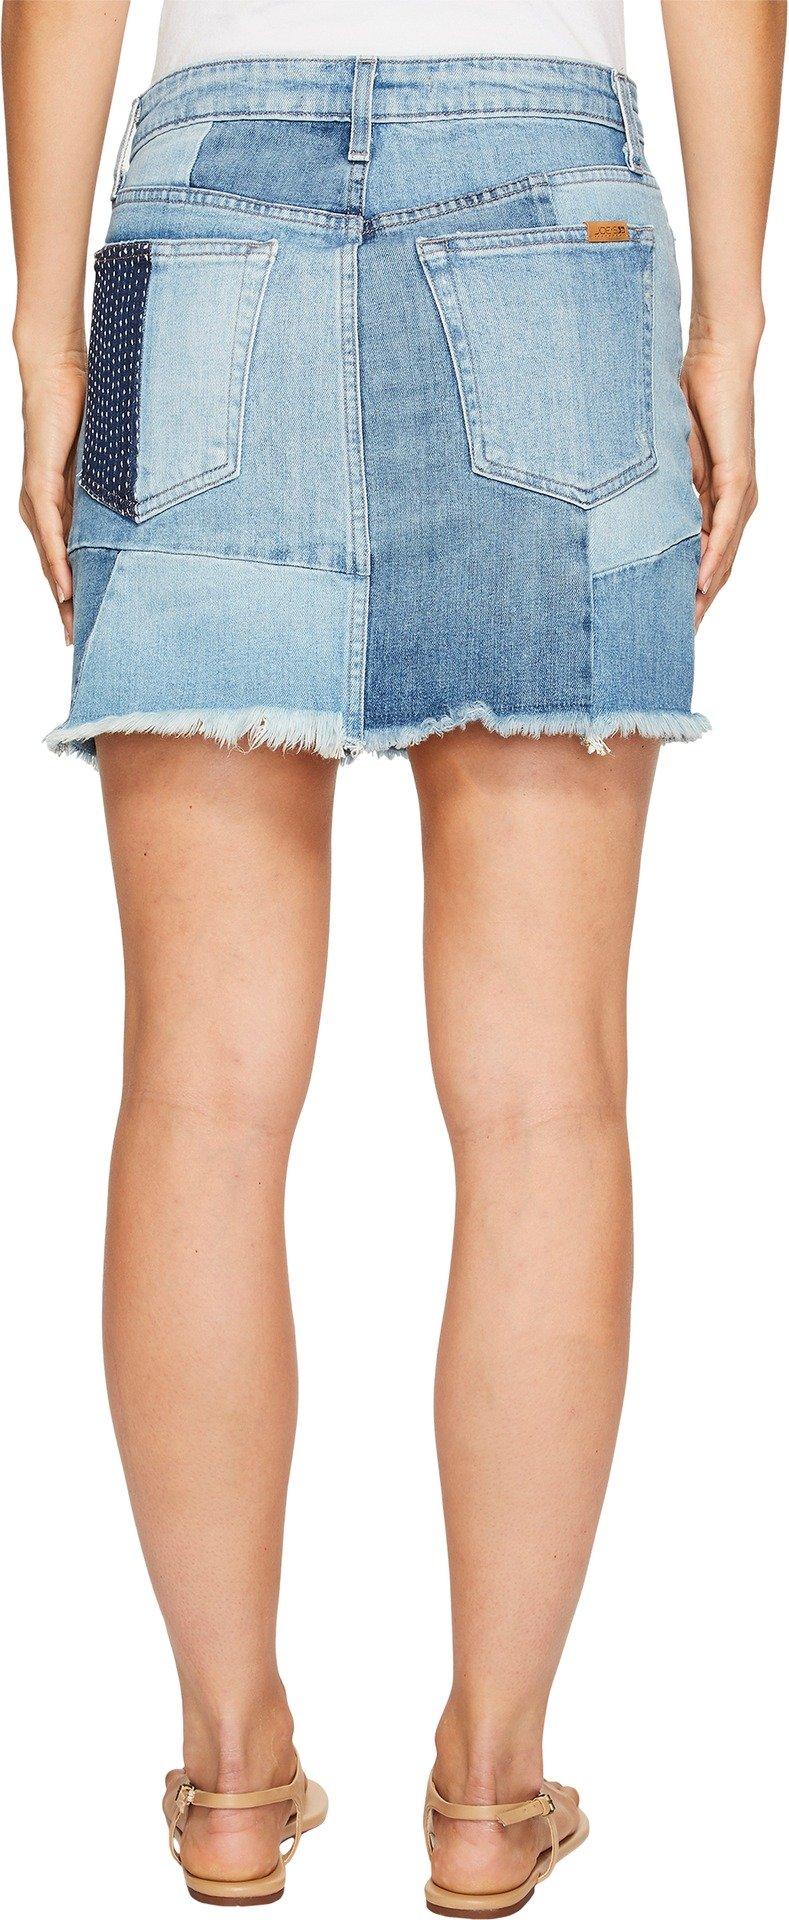 Joe's Jeans Women's Patchwork Slit Hem Jean Skirt, Sophia, 27